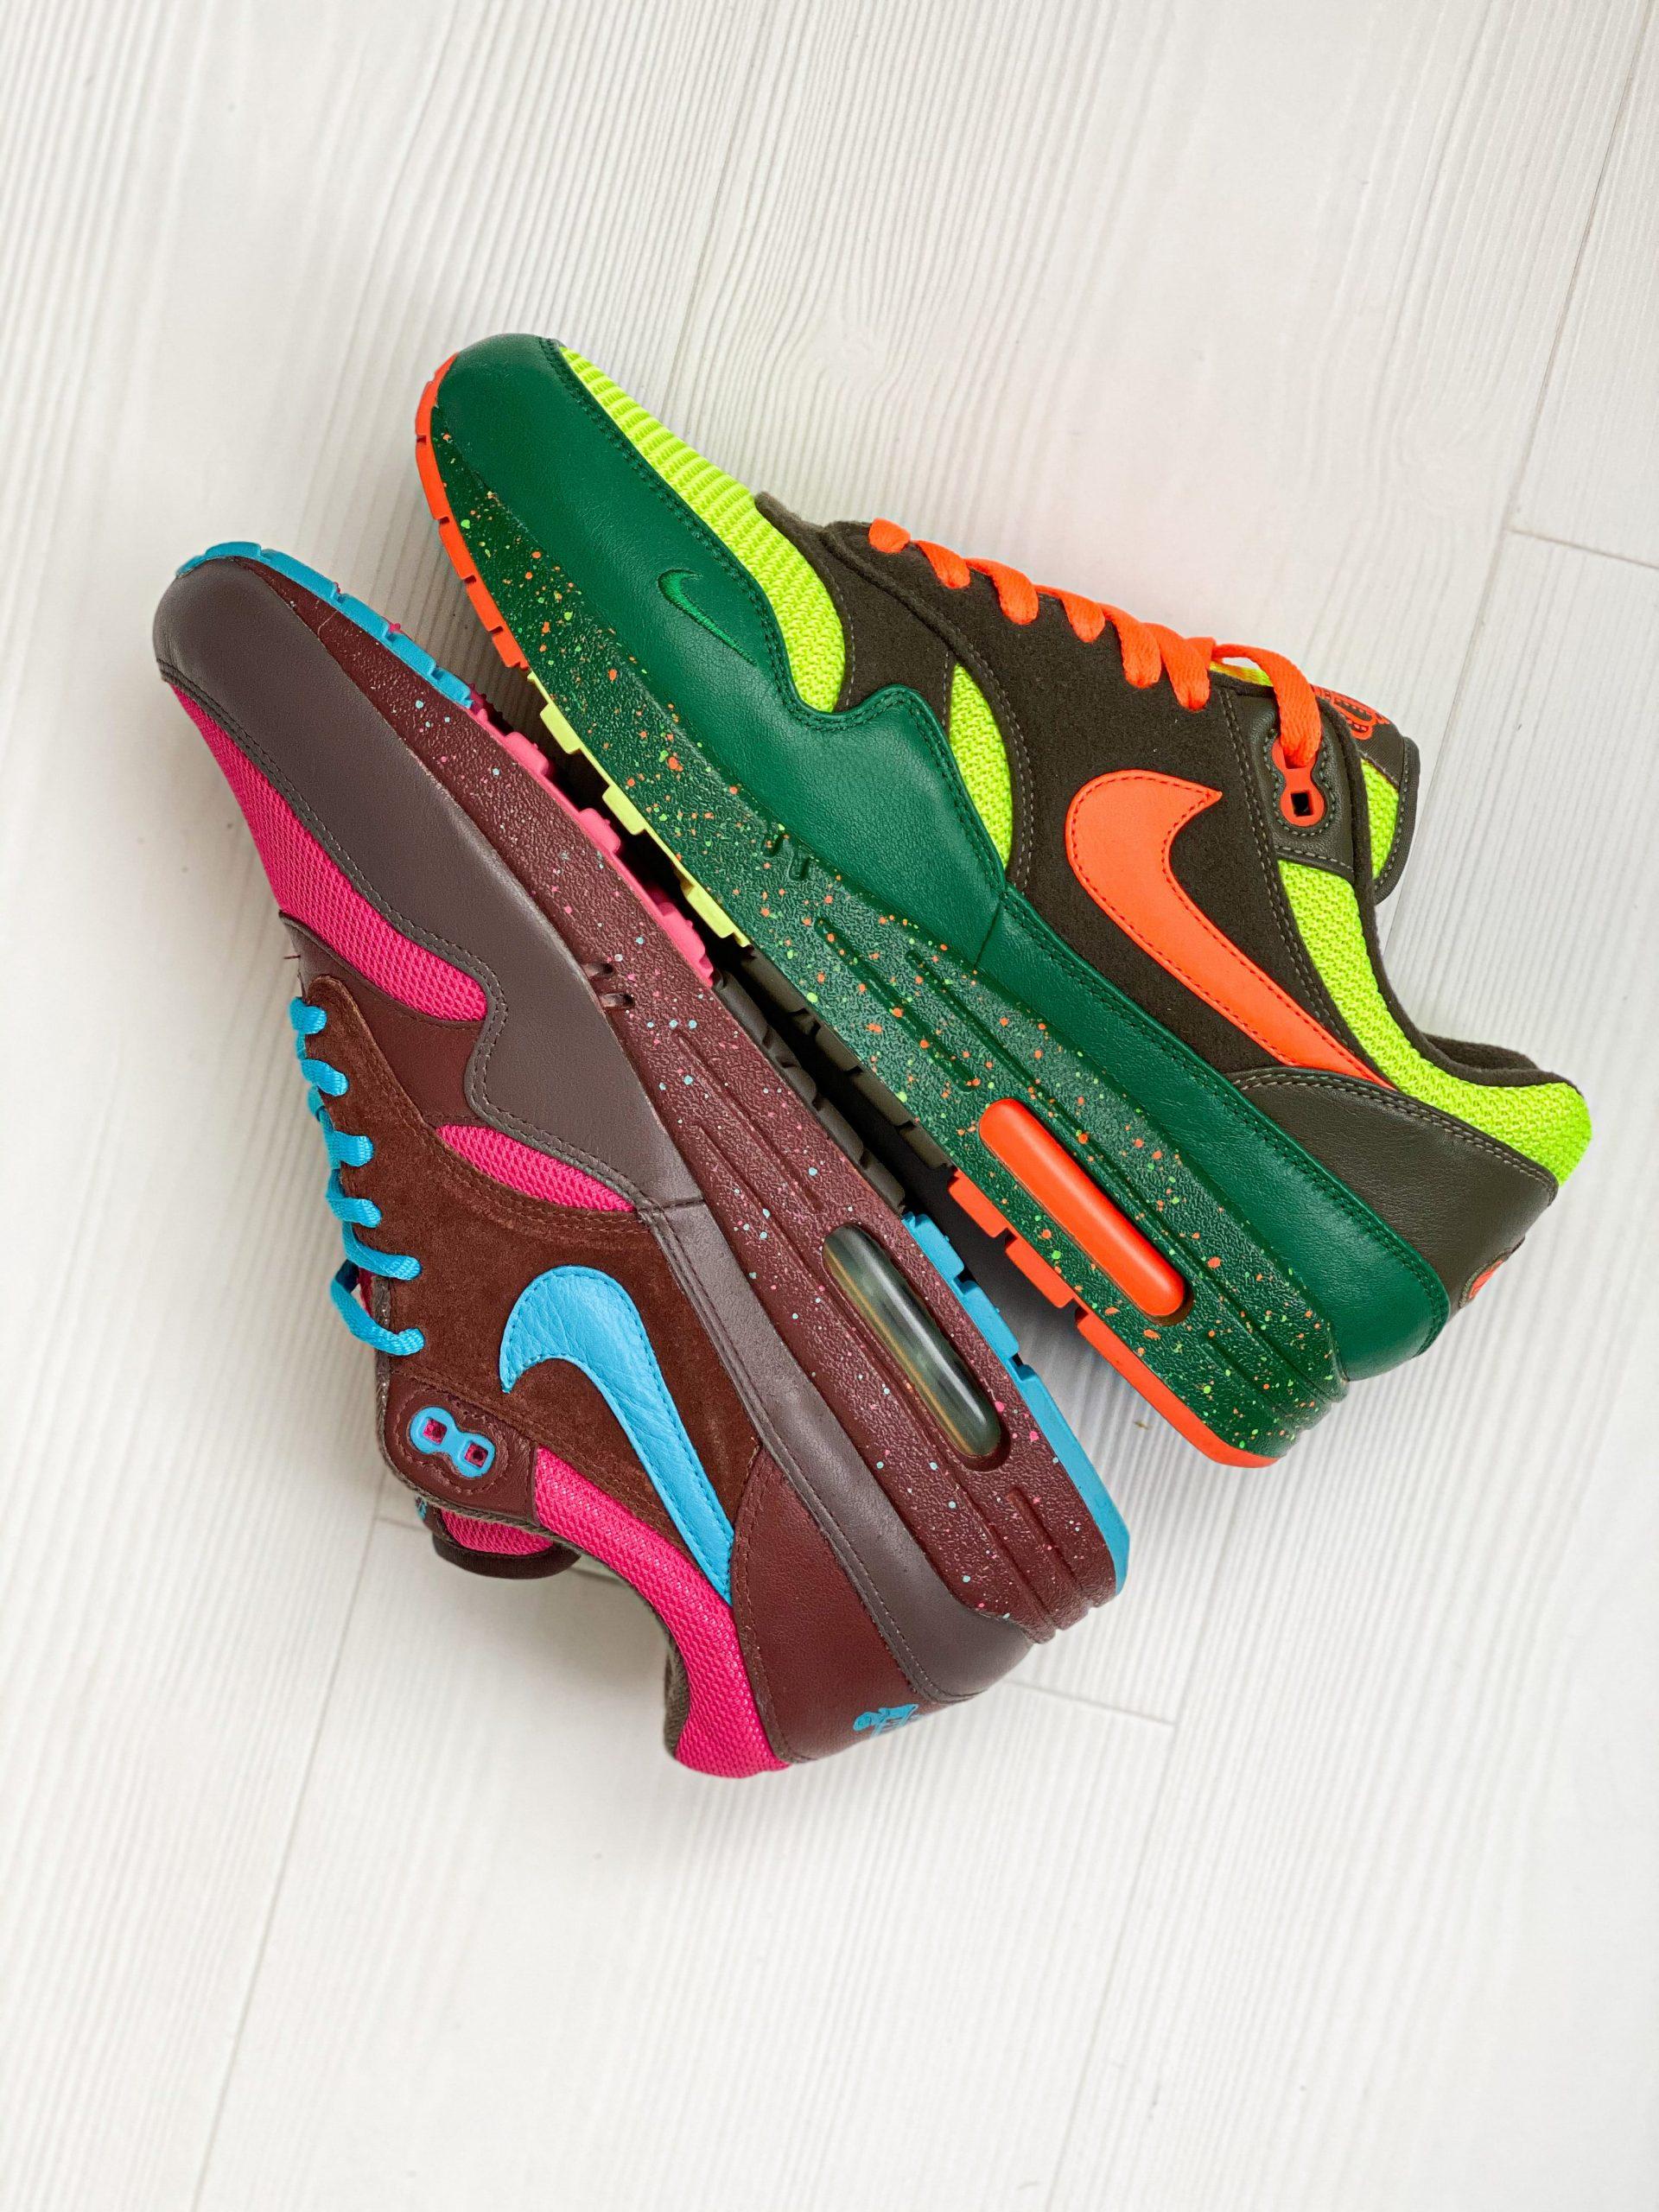 Nike Bespoke Green Amsterdam @tomasterrr